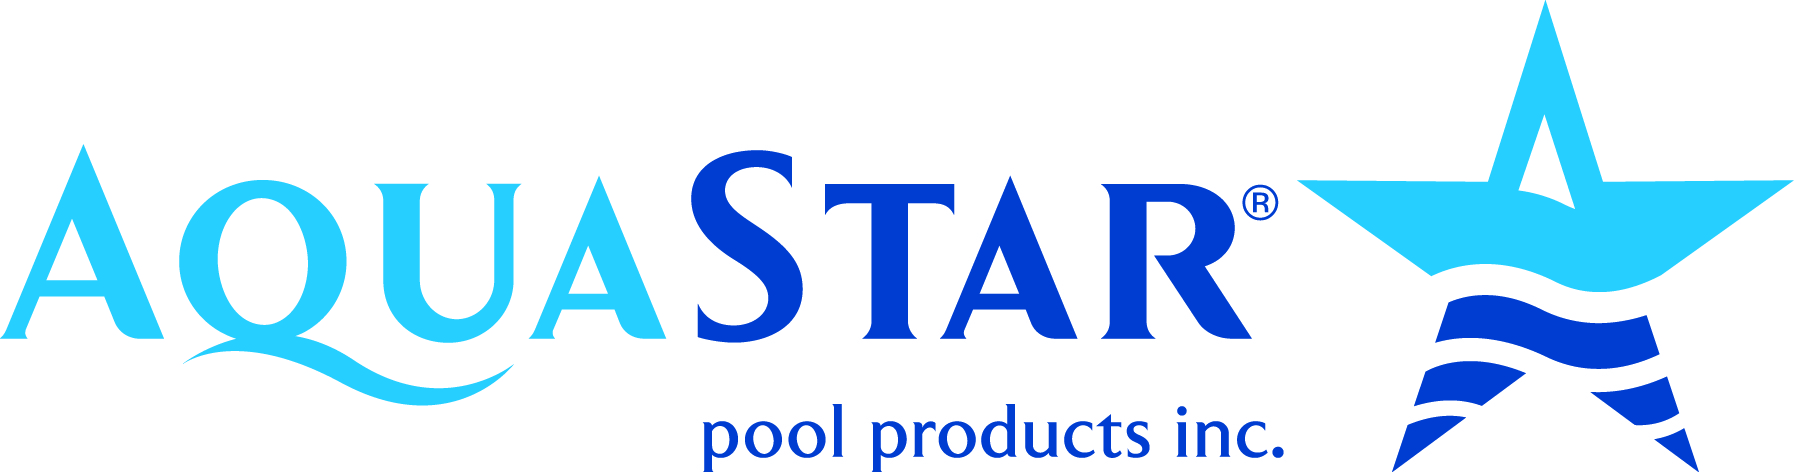 Aquastar.jpg